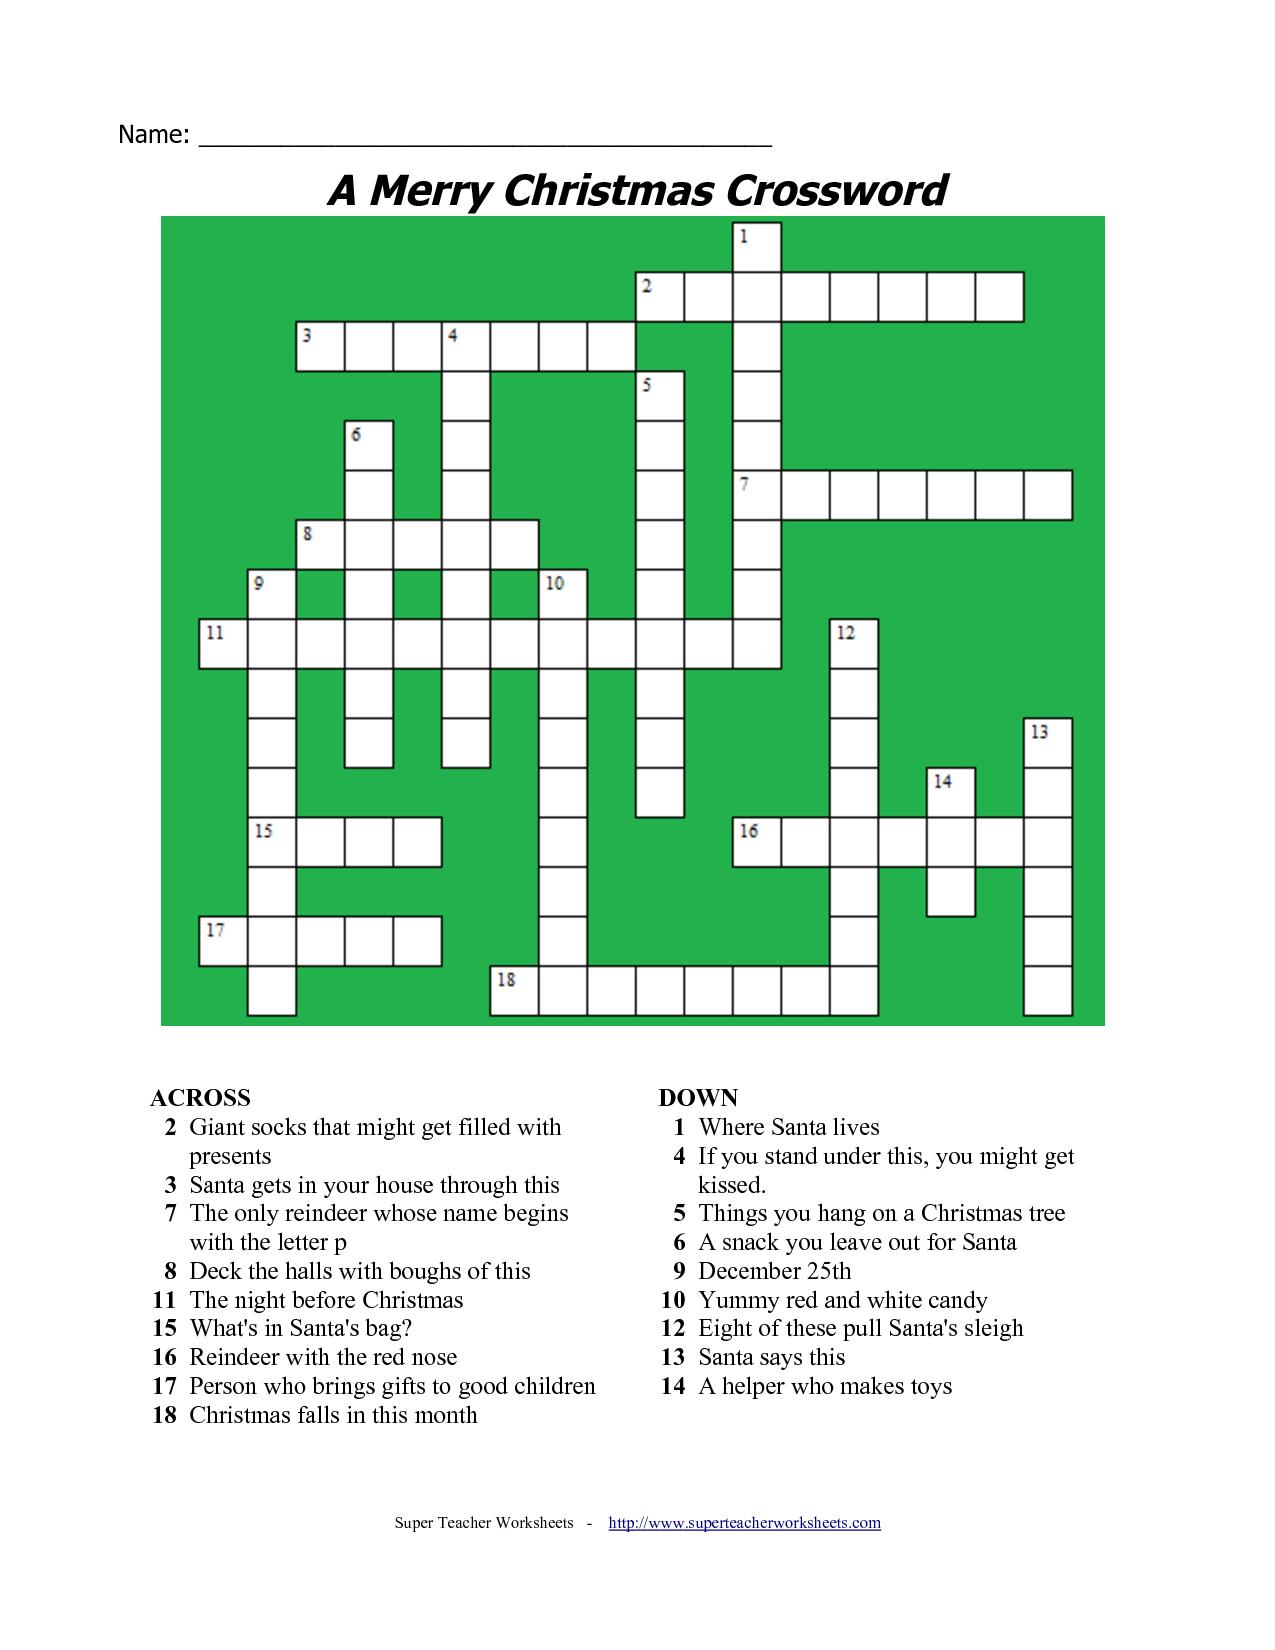 20 Fun Printable Christmas Crossword Puzzles   Kittybabylove - Free Printable Christmas Puzzle Sheets